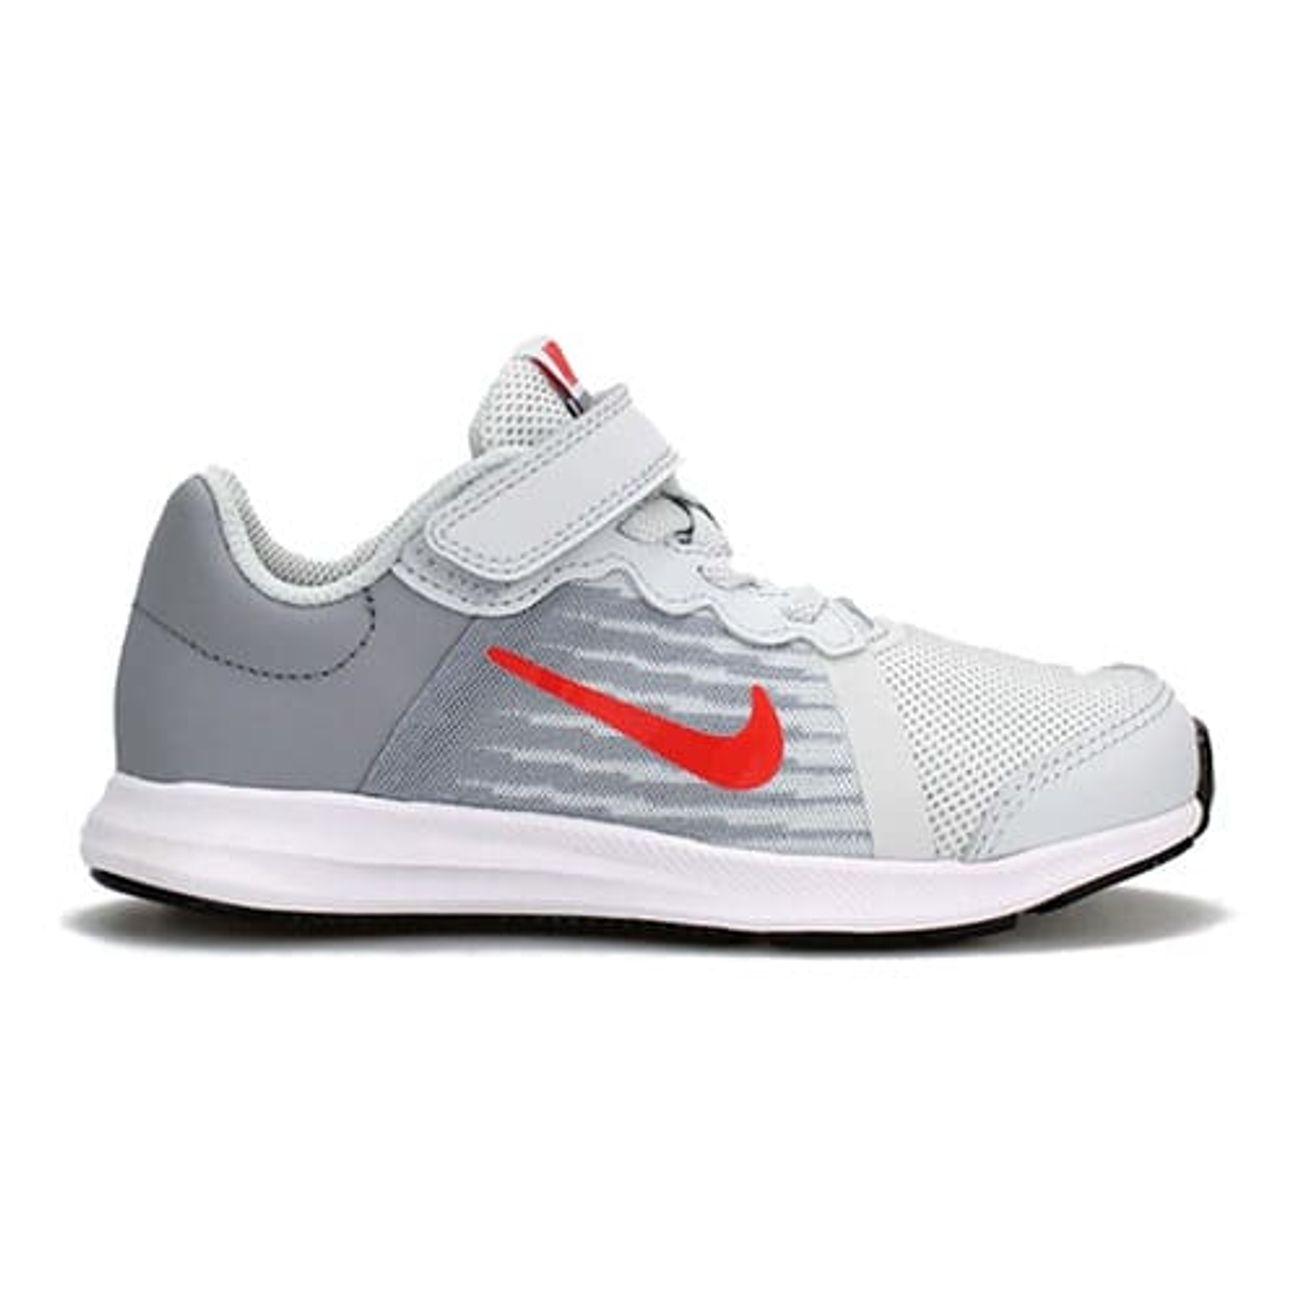 Gris Downshifter 8 Ps Nike Homme Enfant Orange Chaussures Blanc xBEQrdCWoe